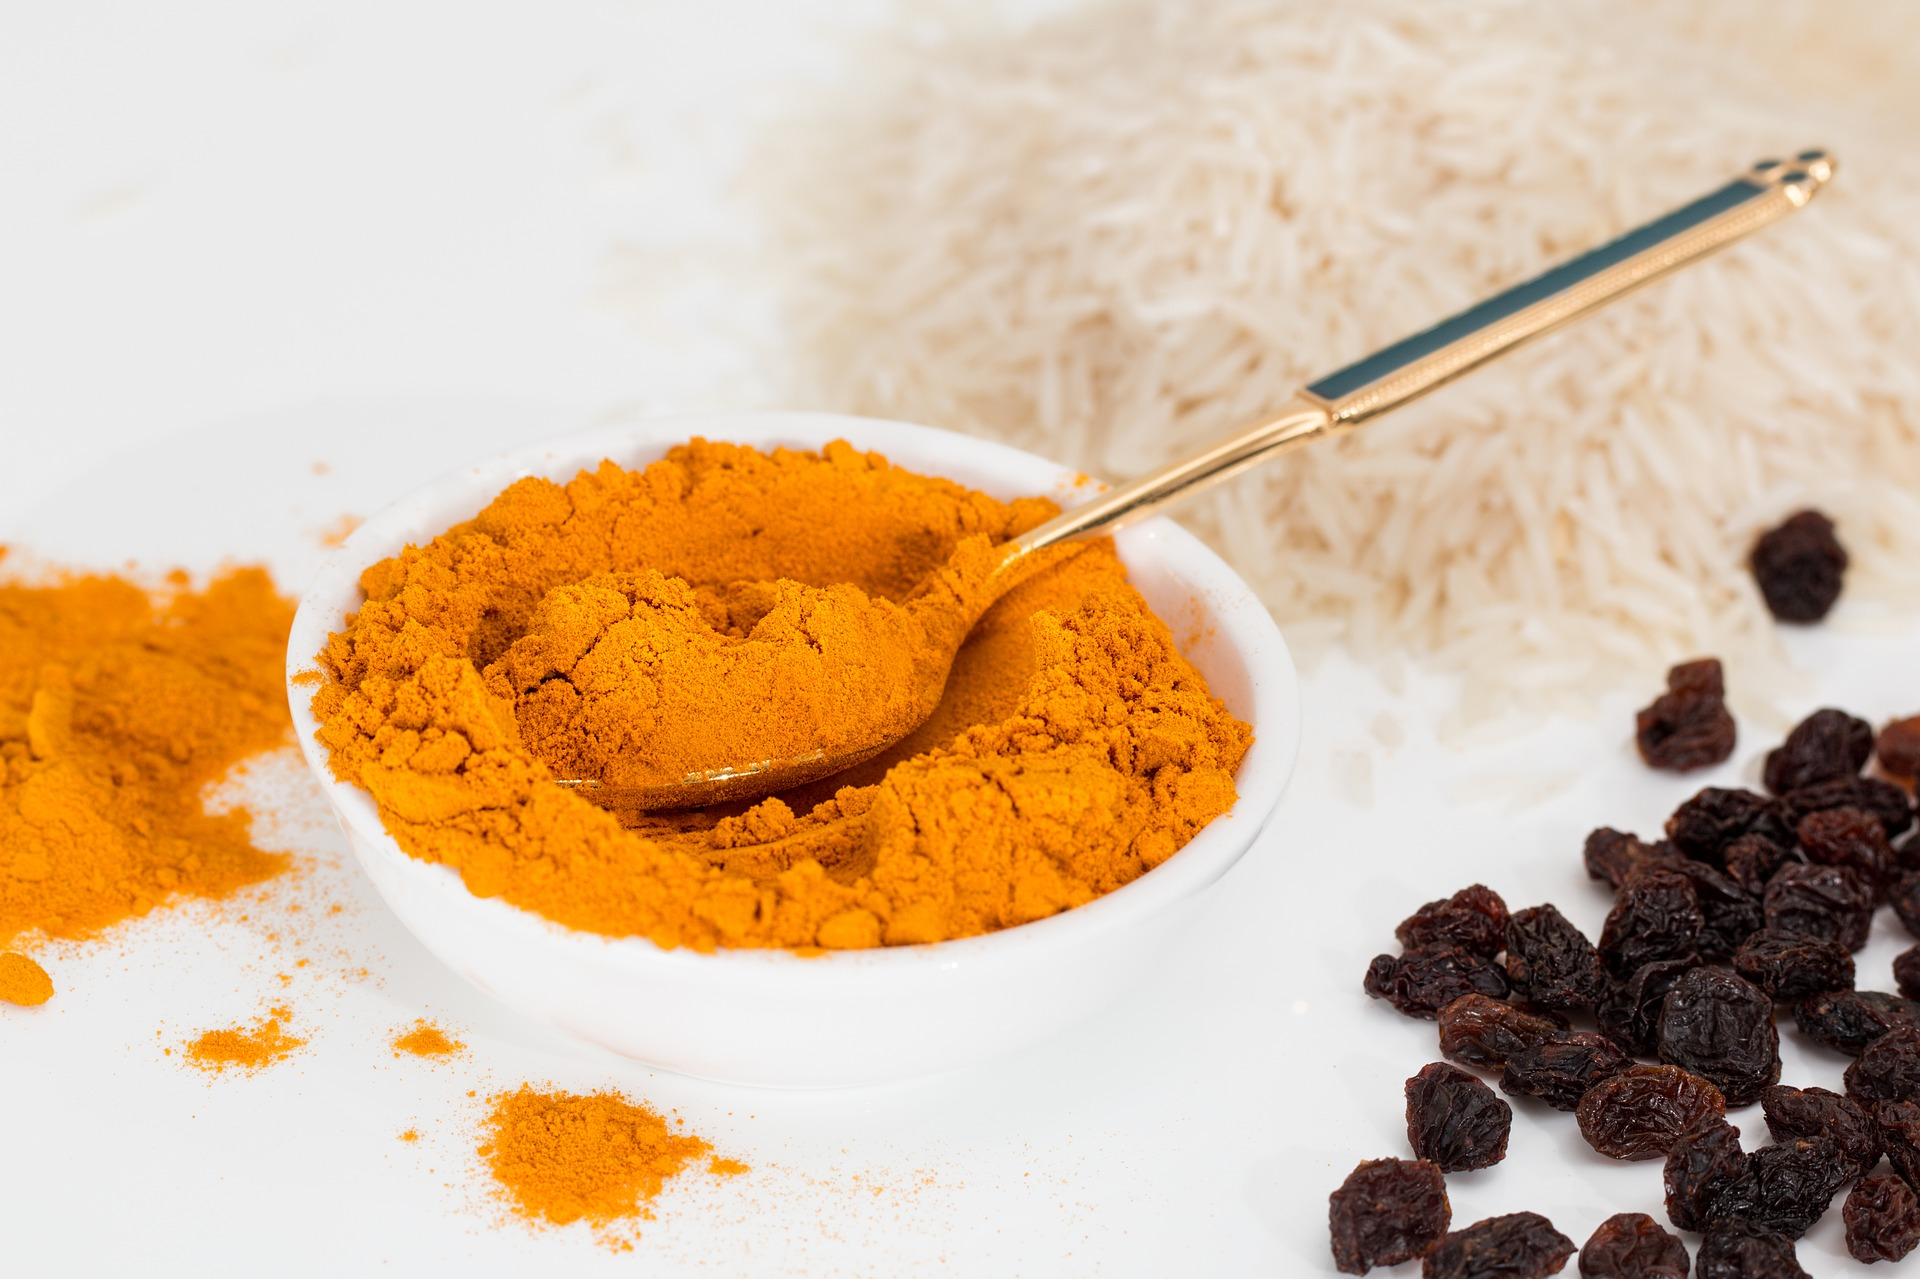 Turmeric All Natural Anti-Inflammatory Food